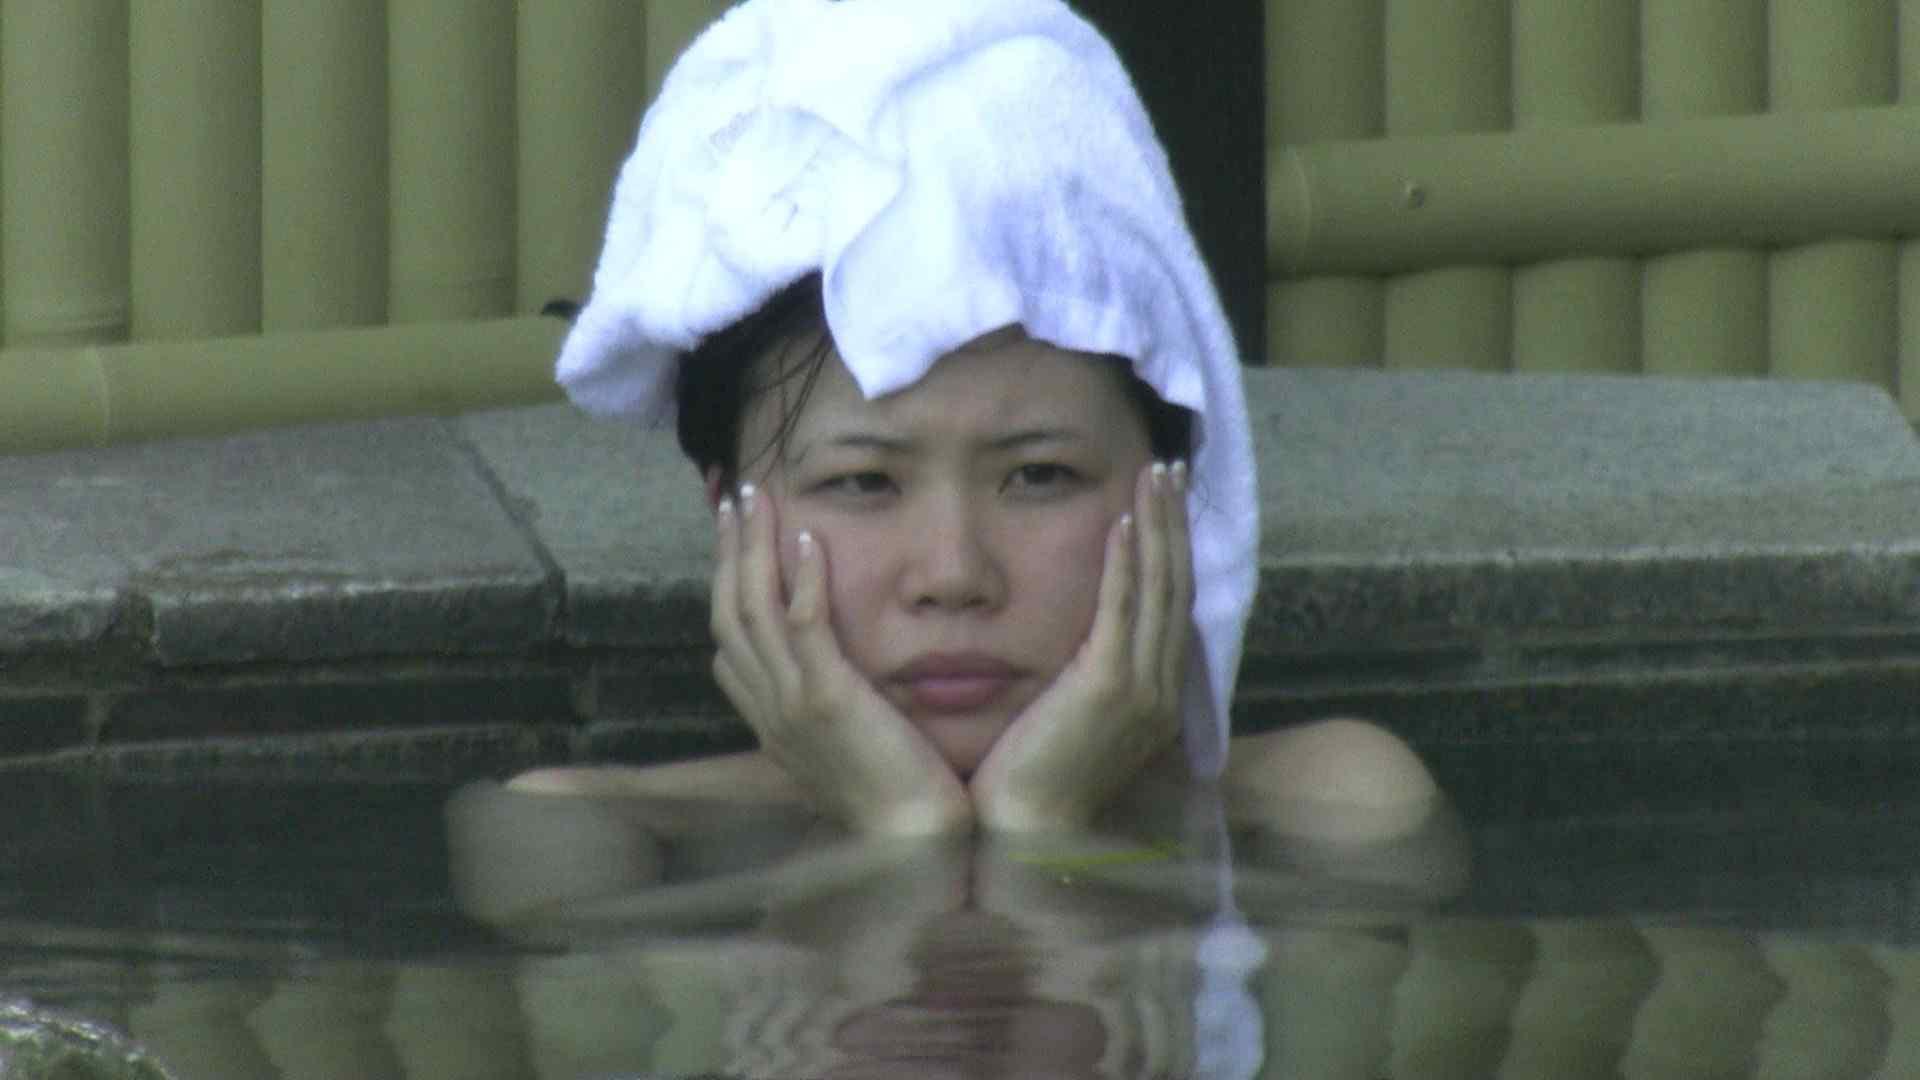 Aquaな露天風呂Vol.183 盗撮師作品 エロ無料画像 105pic 101